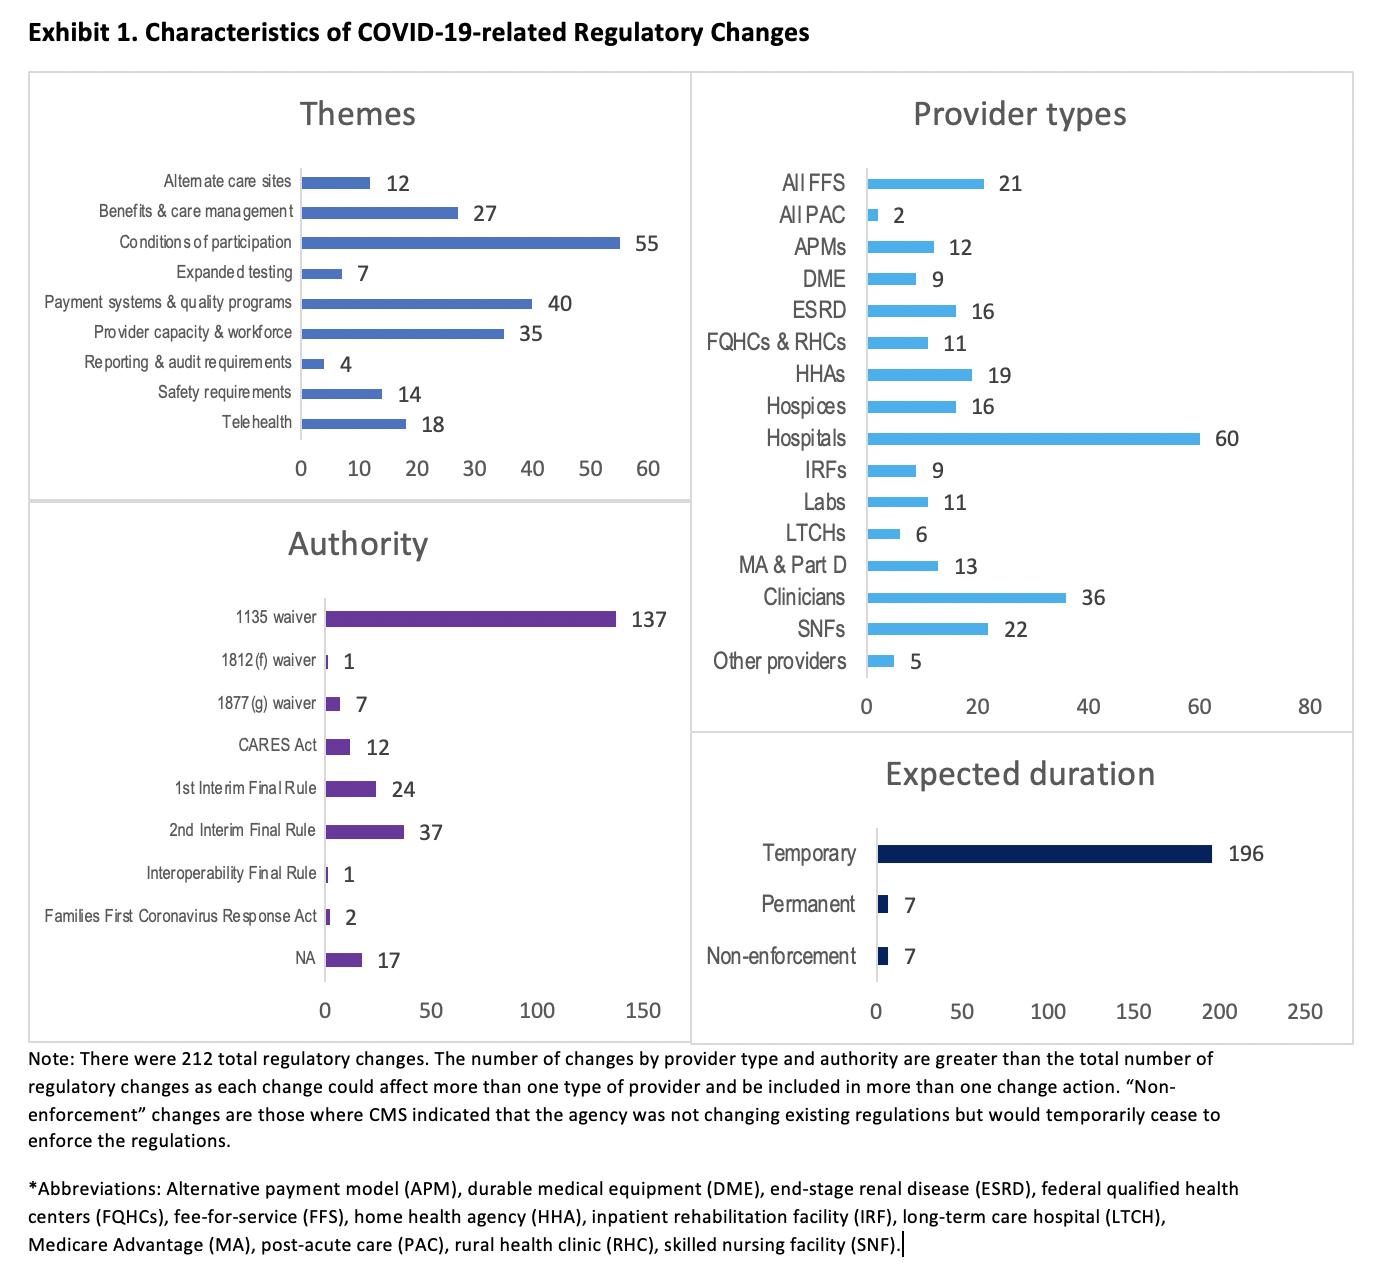 Characteristics of COVID-19-related Regulatory Changes